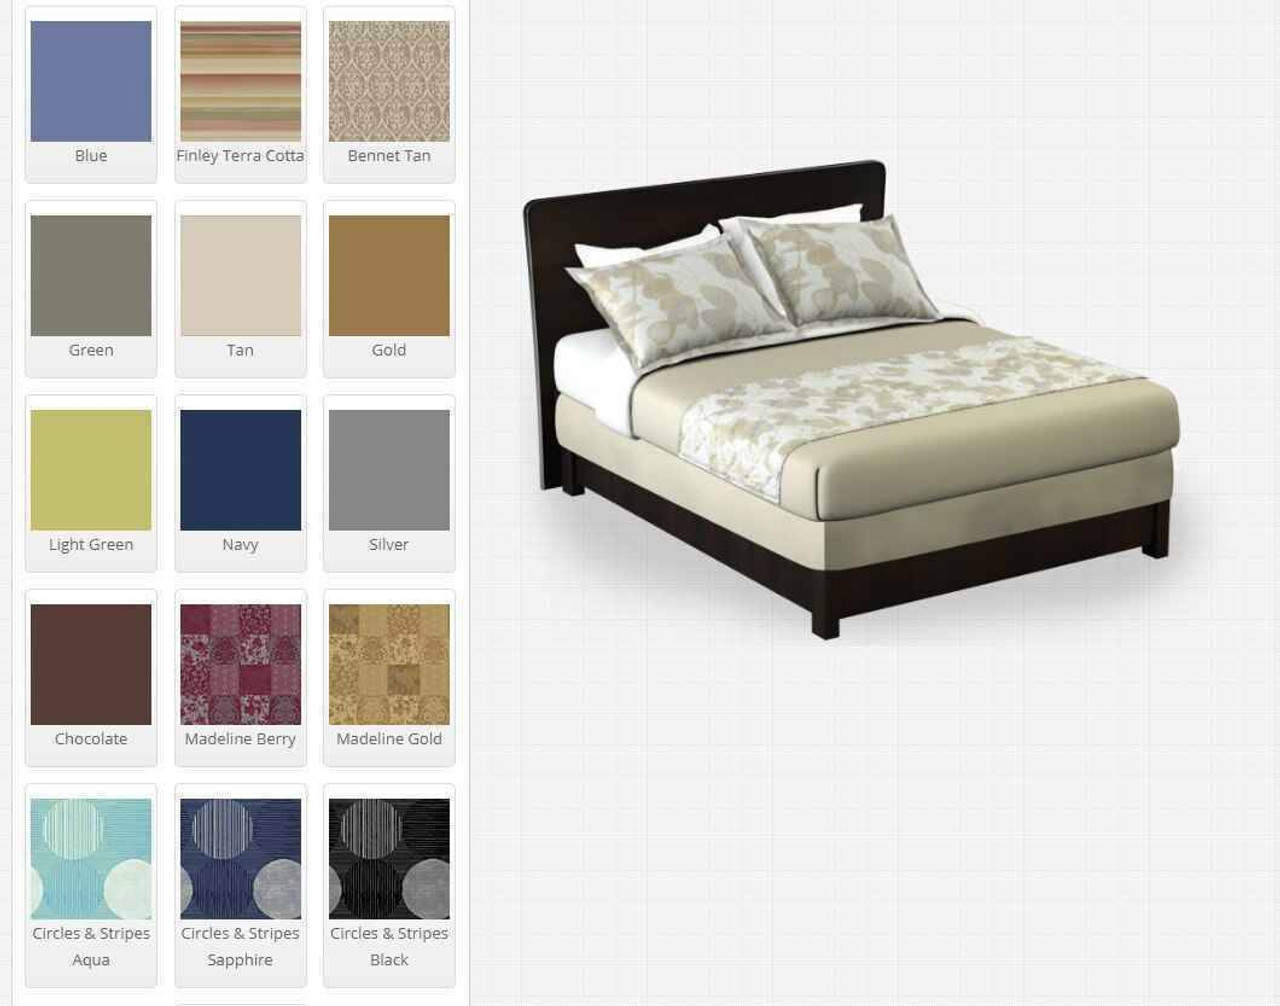 Martex RX Bedding by Westpoint Hospitality Martex Rx Bedding or Bed Scarf - All Styles